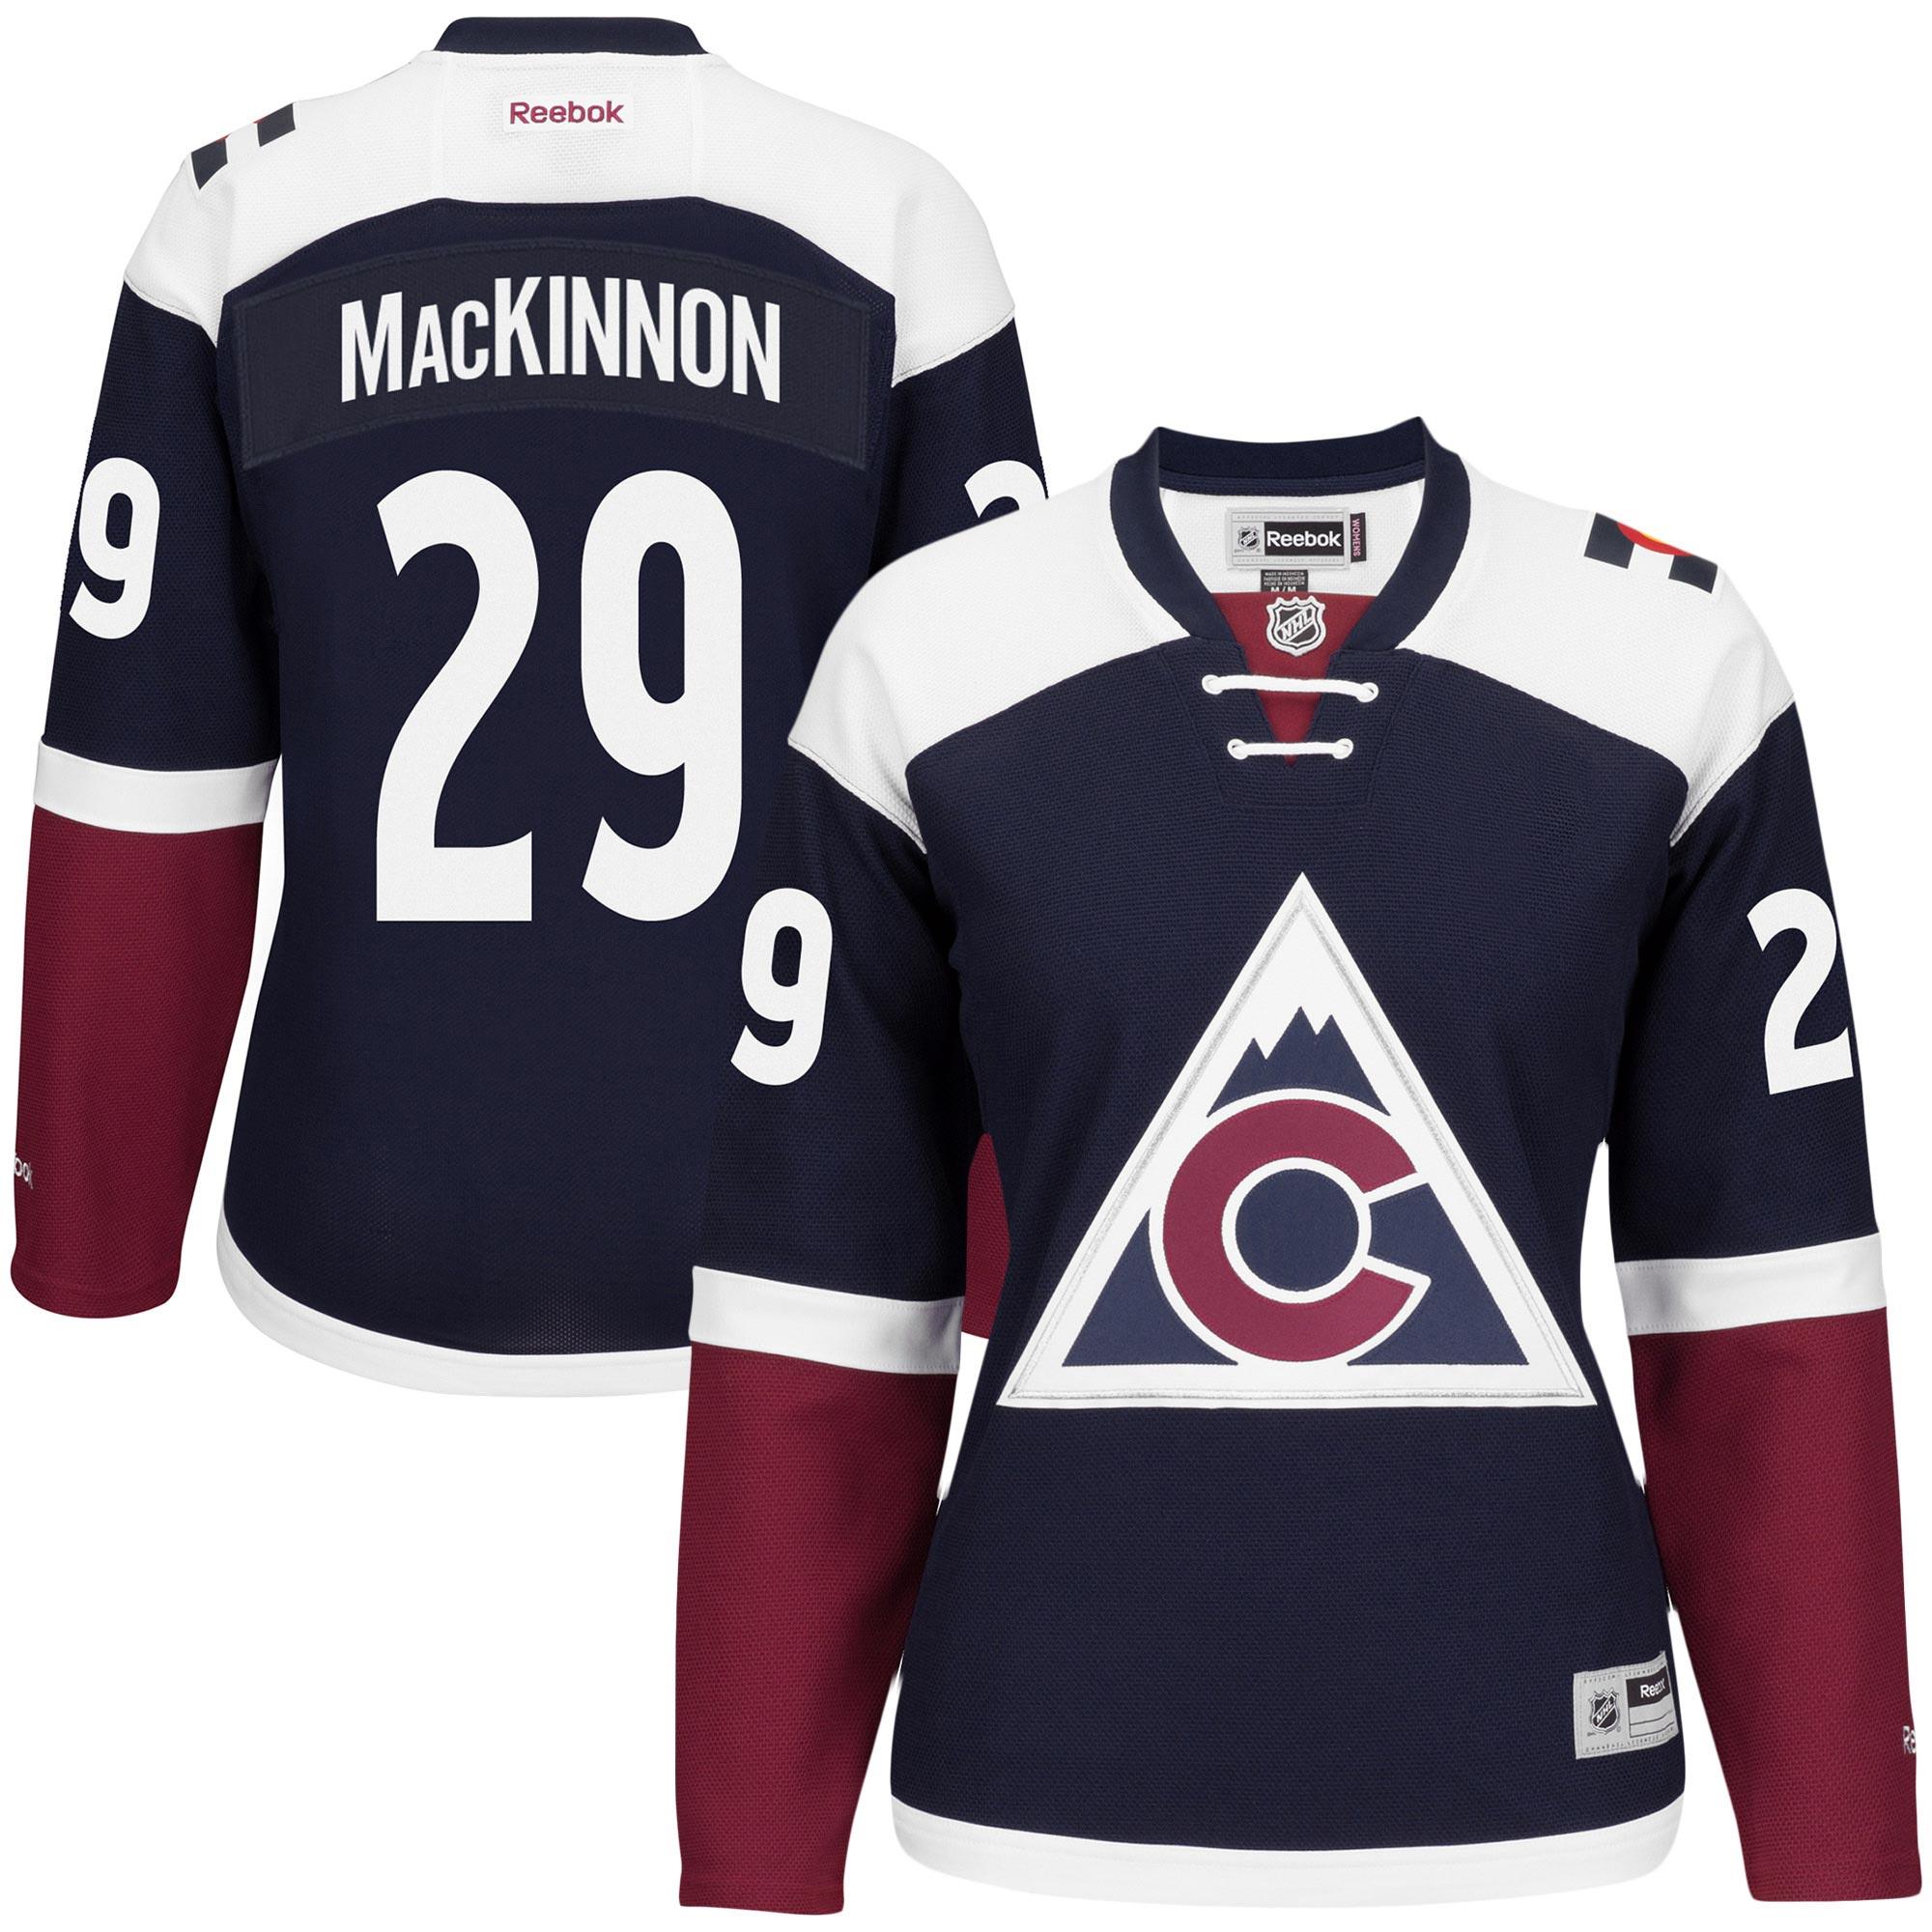 buy cheap 9f9c7 663b2 Nathan MacKinnon Colorado Avalanche Reebok Women's Premier Player Third  Jersey - Navy sold by Best Jerseys